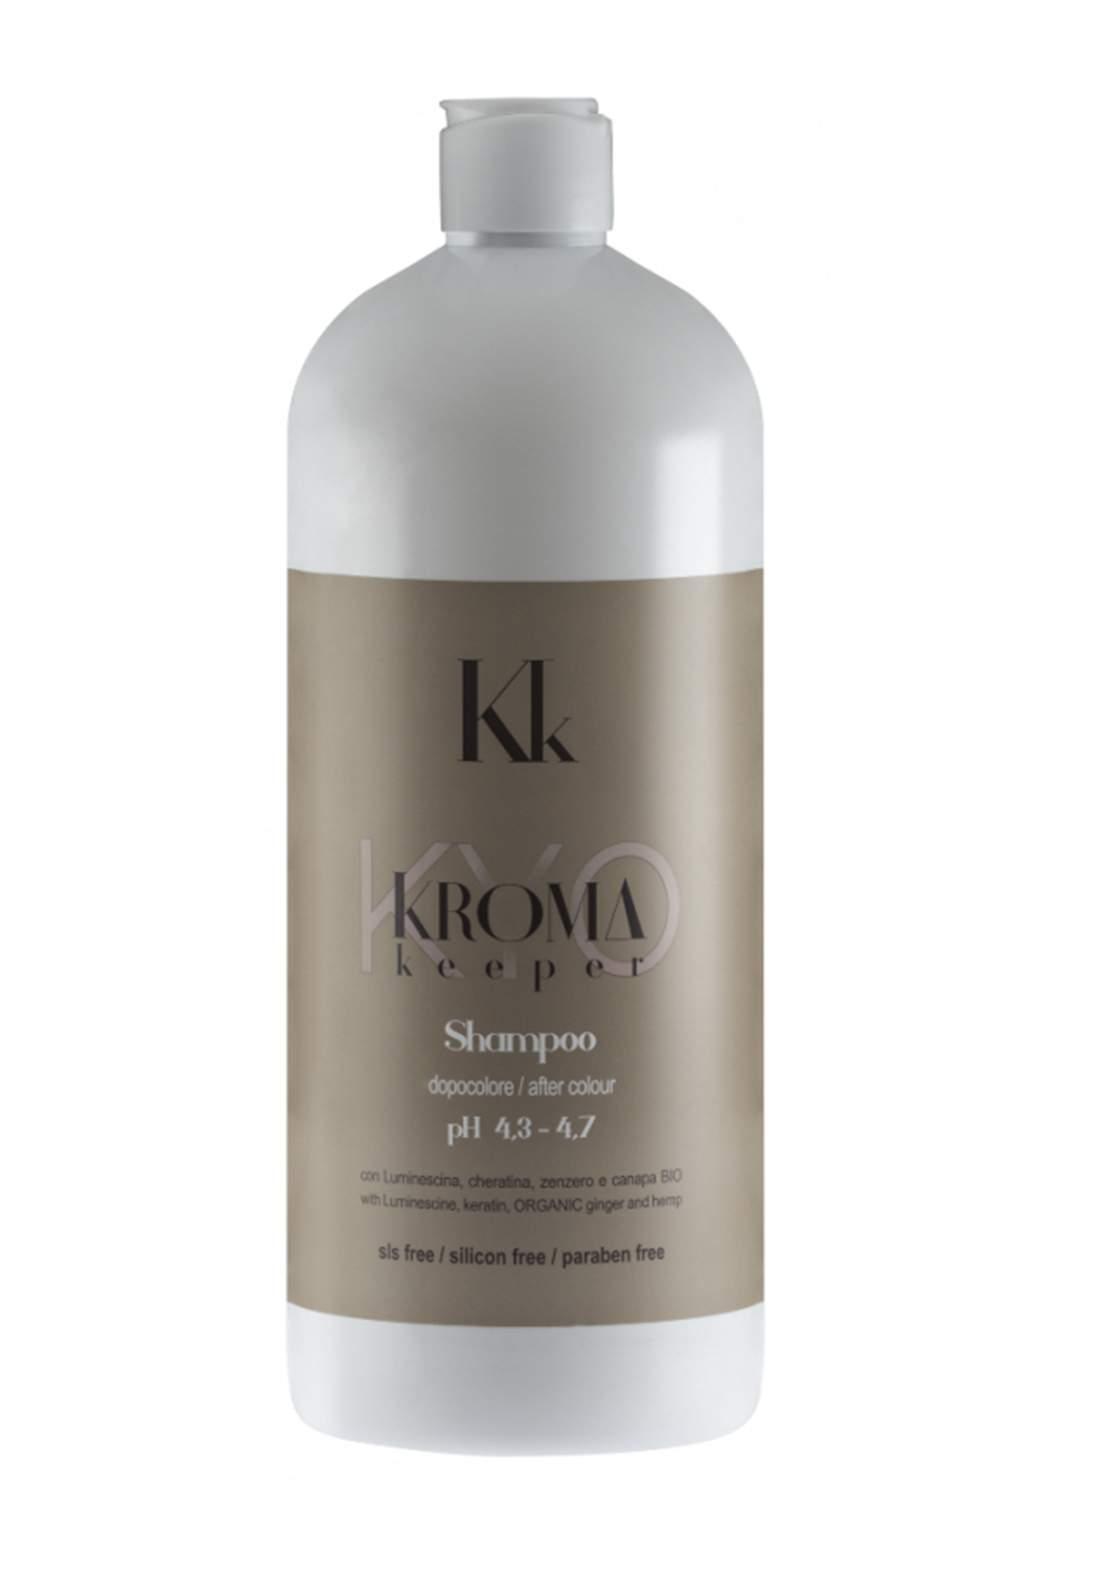 Kyo Kroma Shampoo 250 ml - White شامبو مثبت ألوان